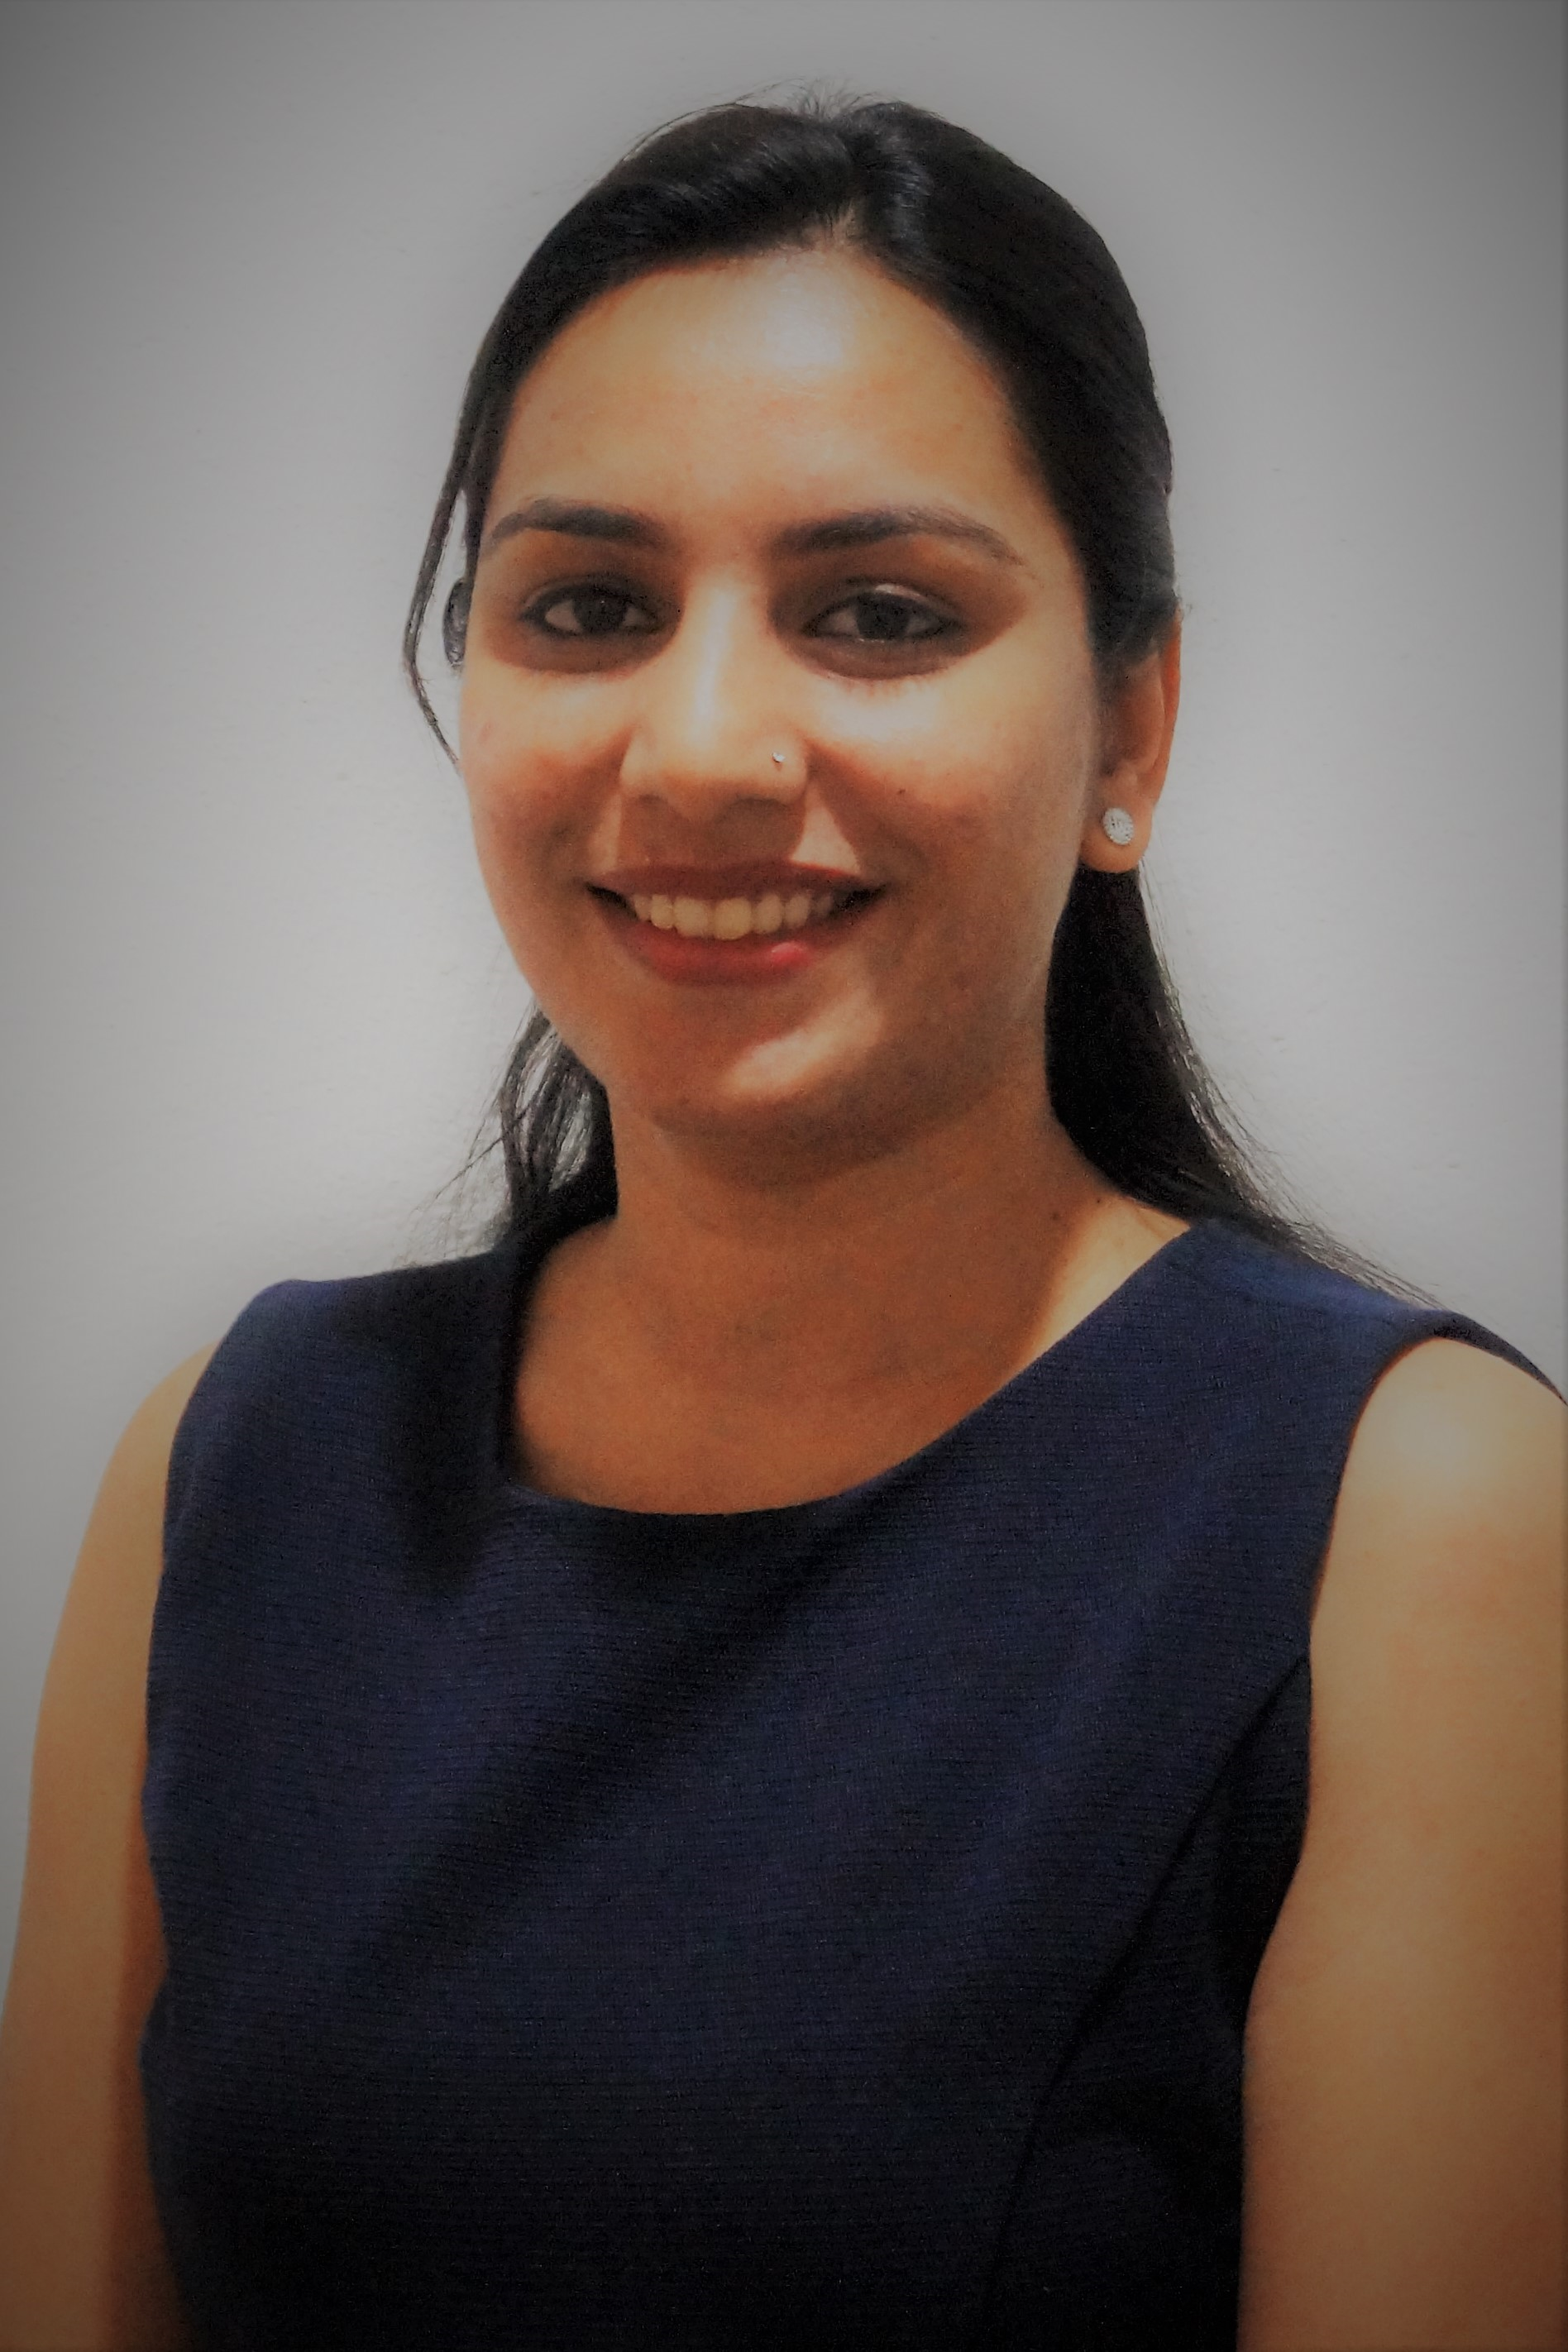 Shilpa Thakur